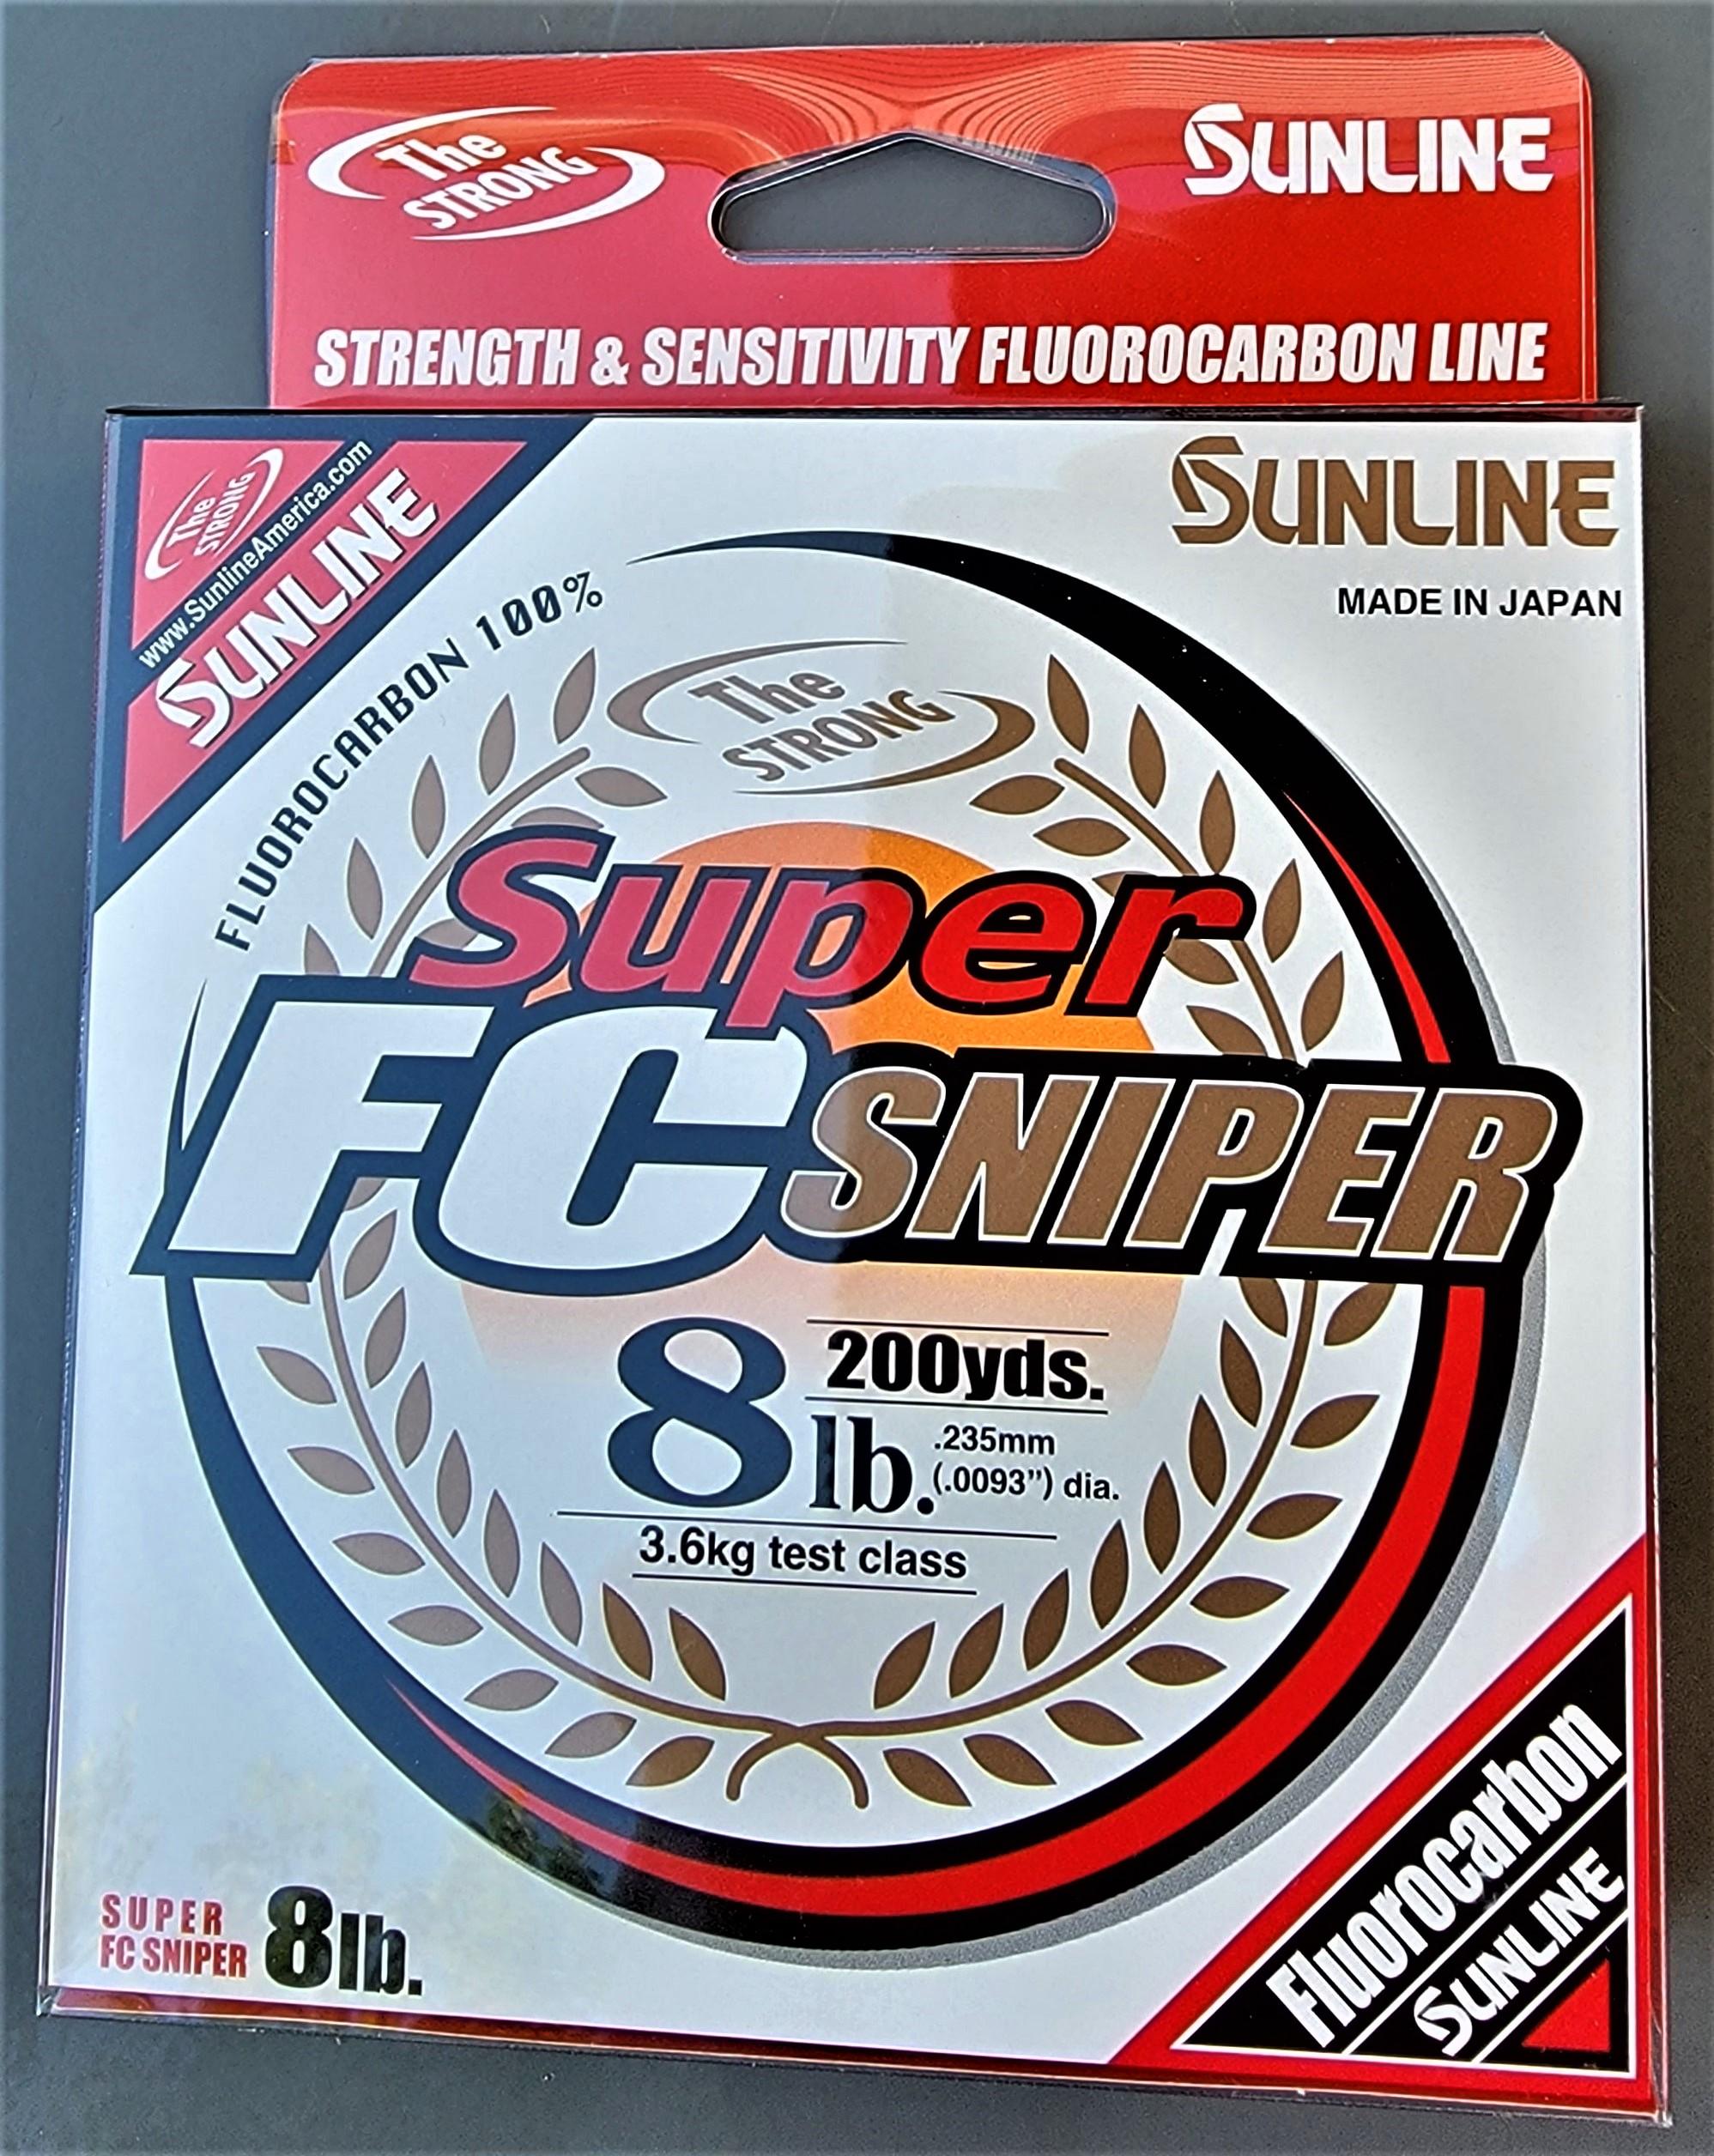 Sunline - Super FC Sniper - 200 YD - Super FC Sniper - 8 LB - Natural Clear